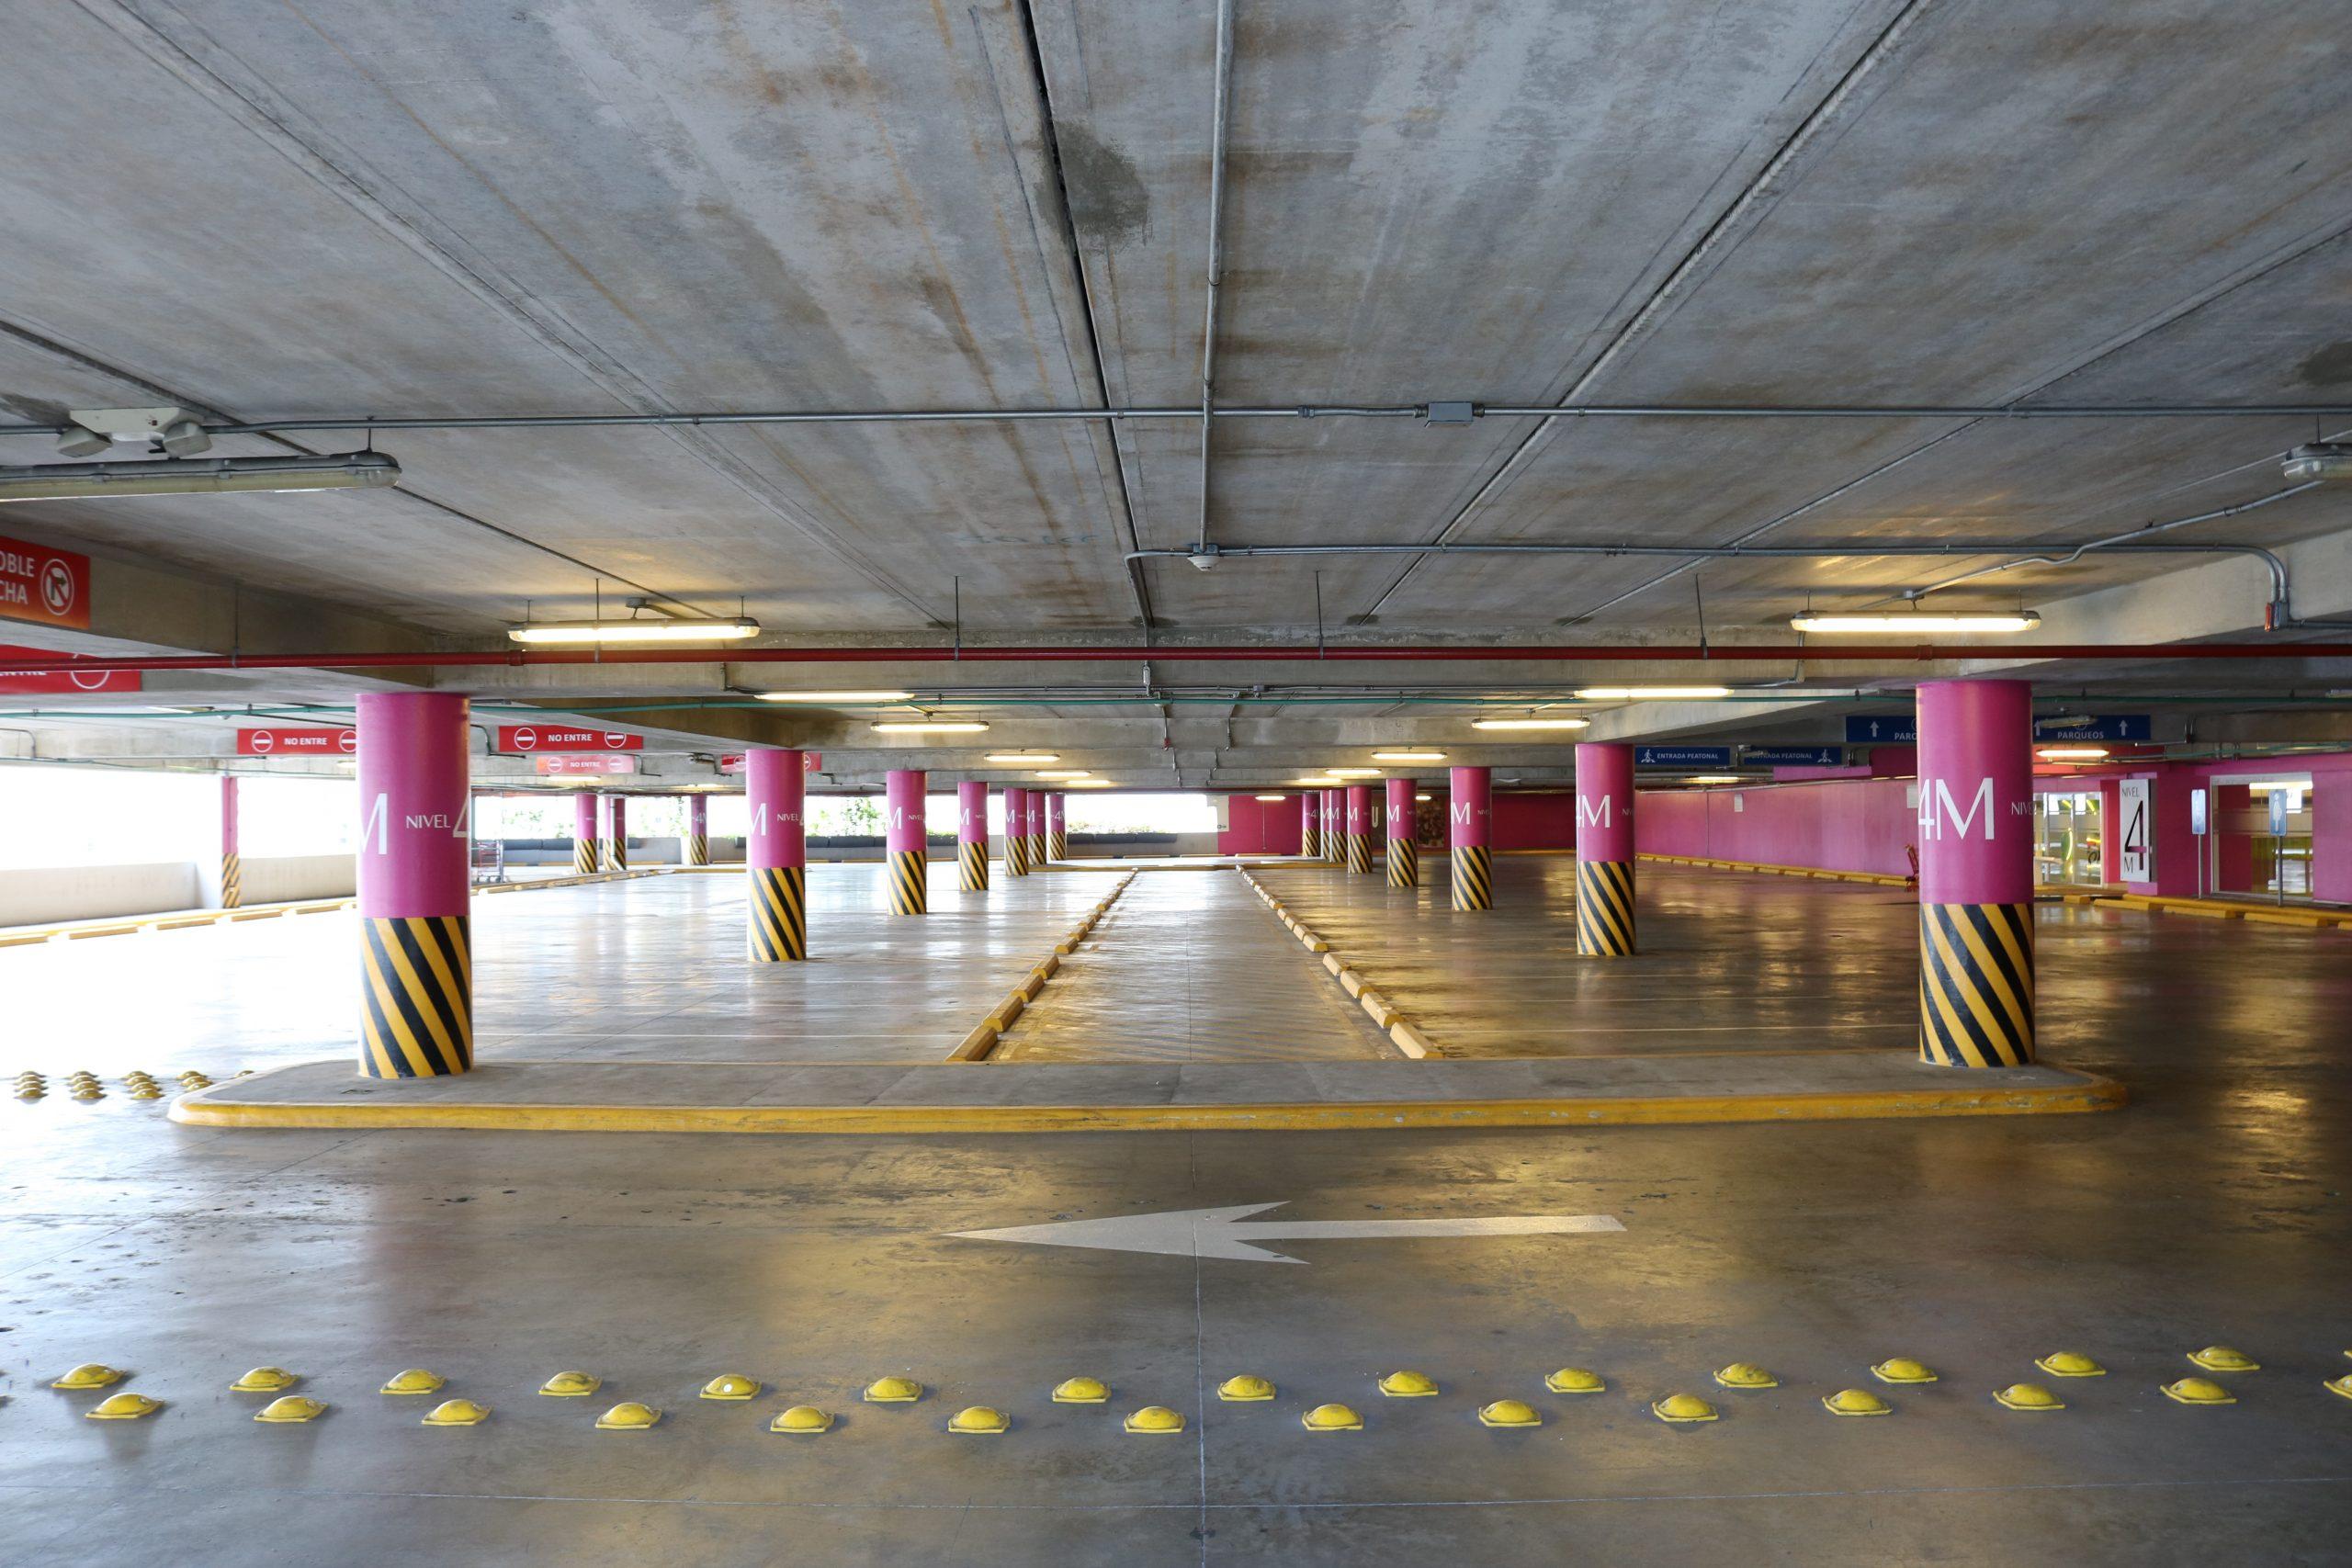 furto de veículos ocorridos em estacionamentos